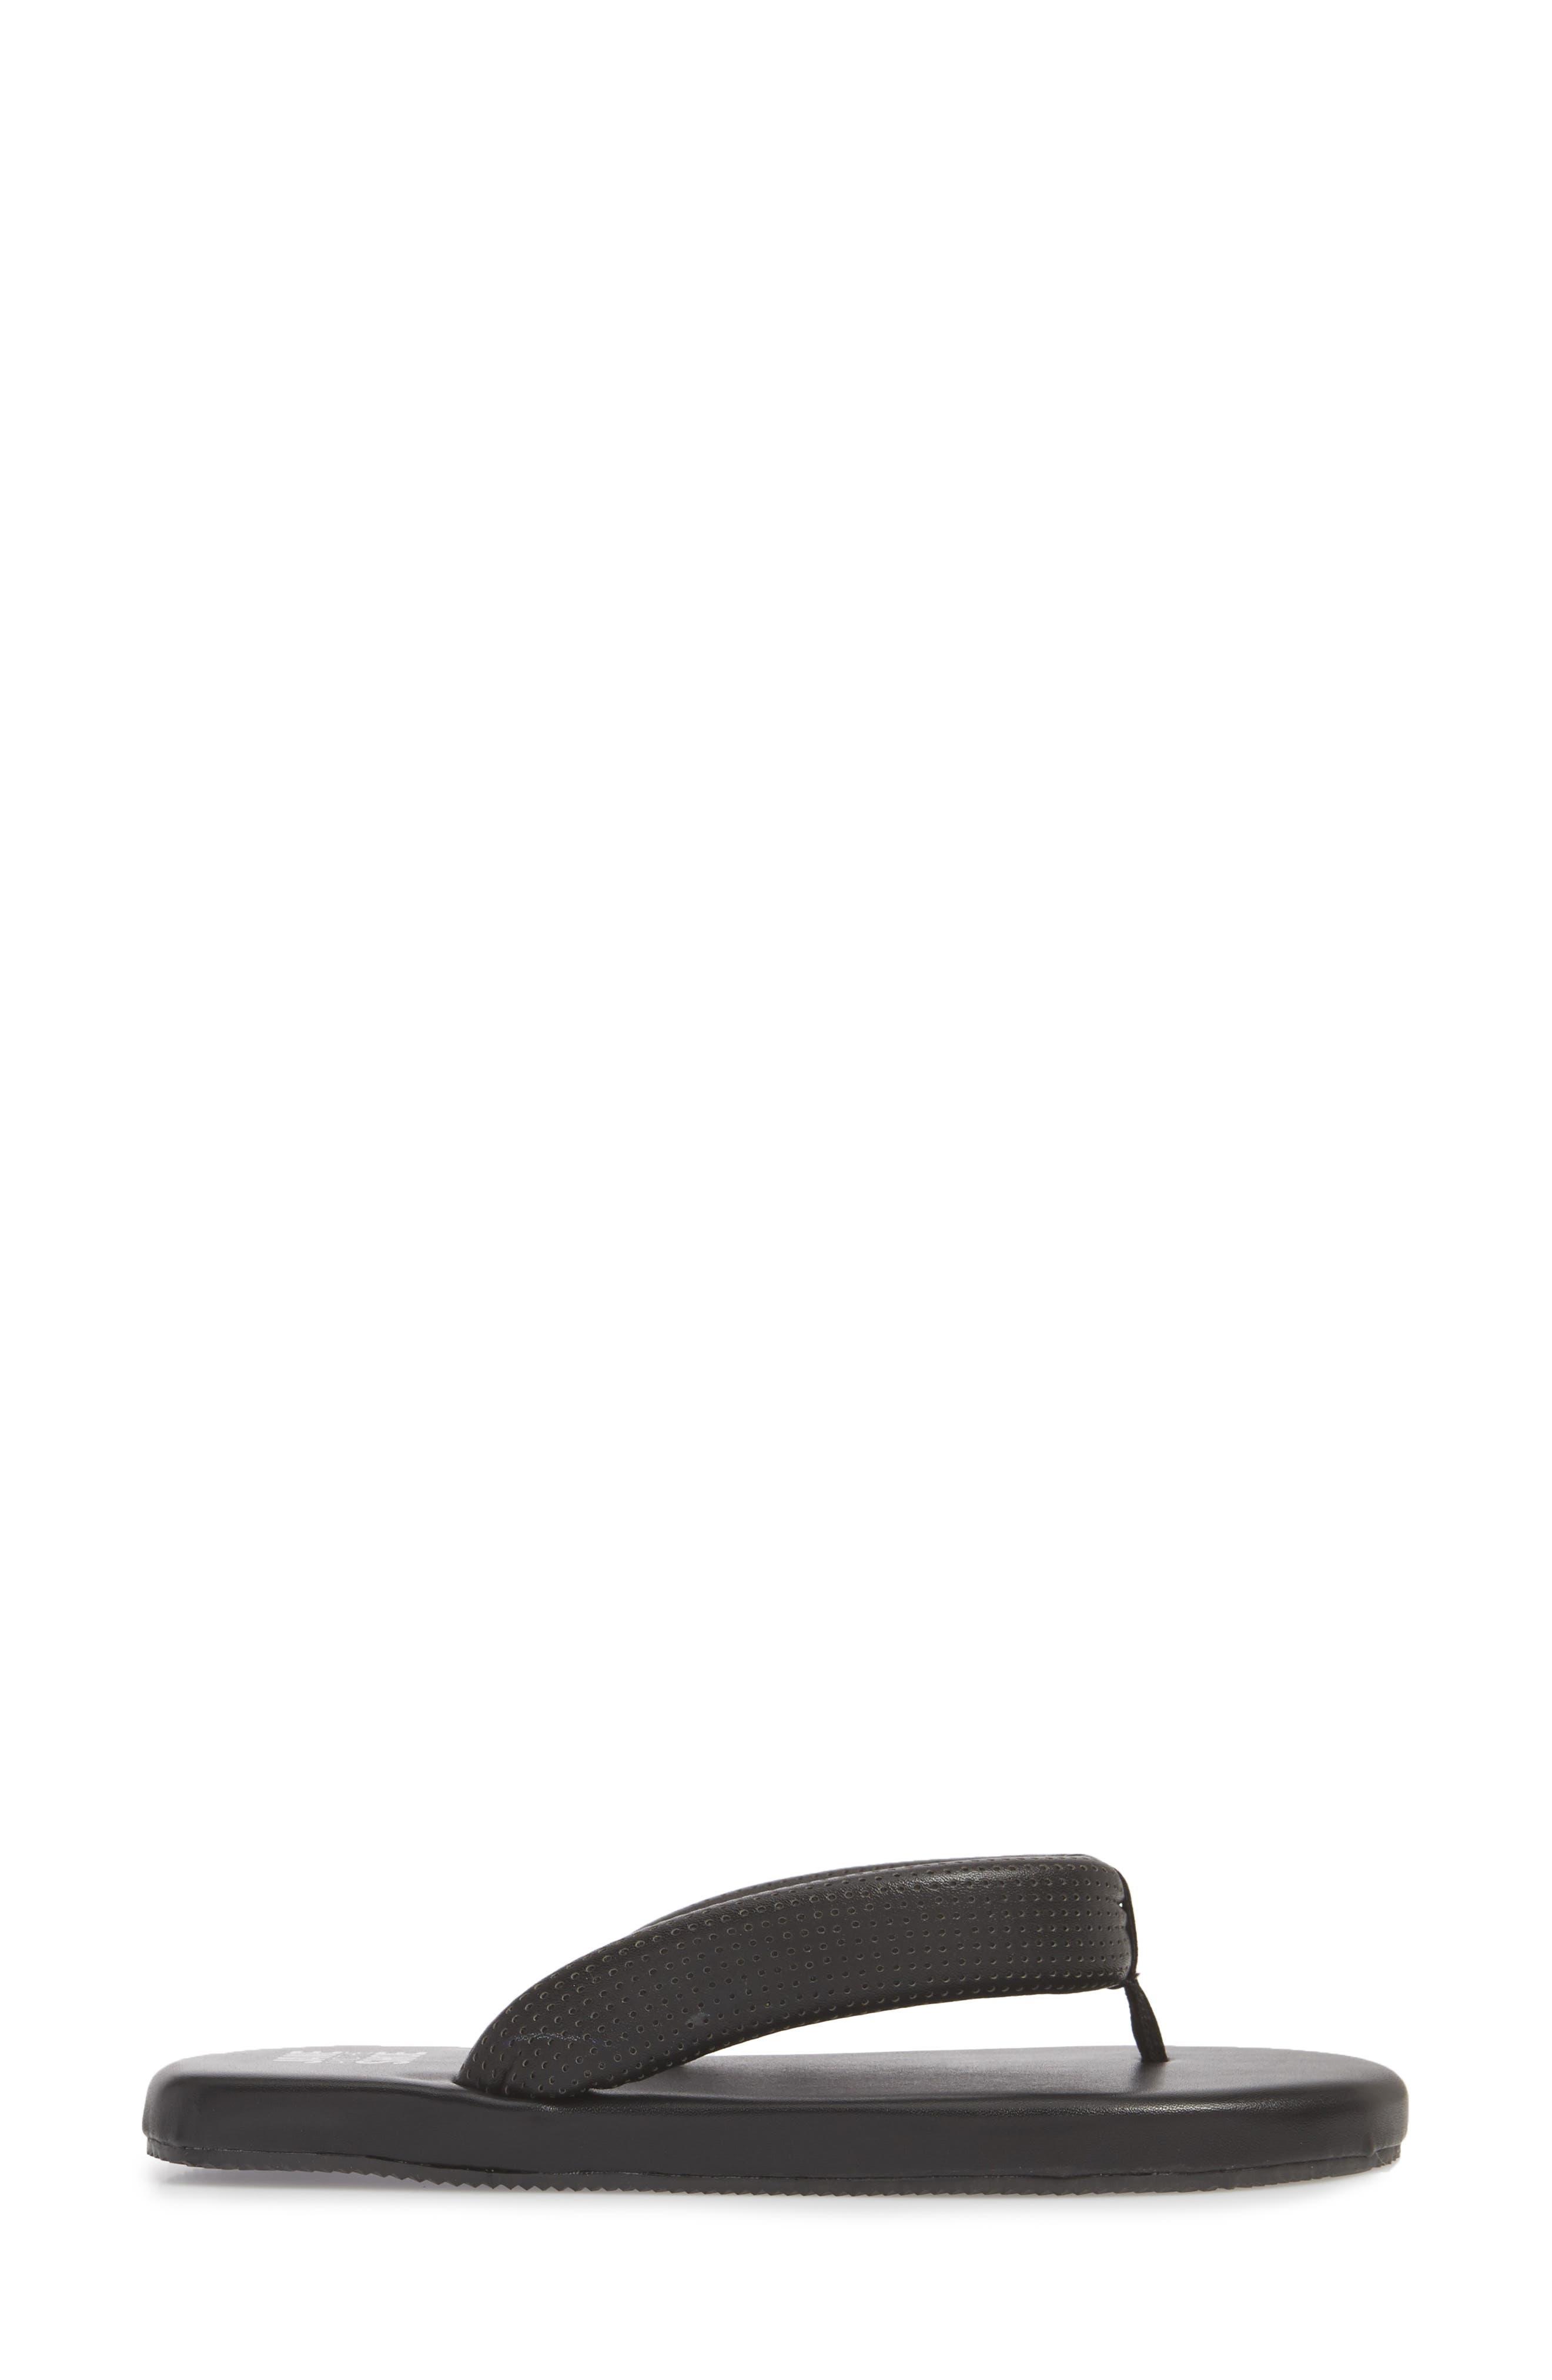 Jaime Plush Flip Flop,                             Alternate thumbnail 6, color,                             Black